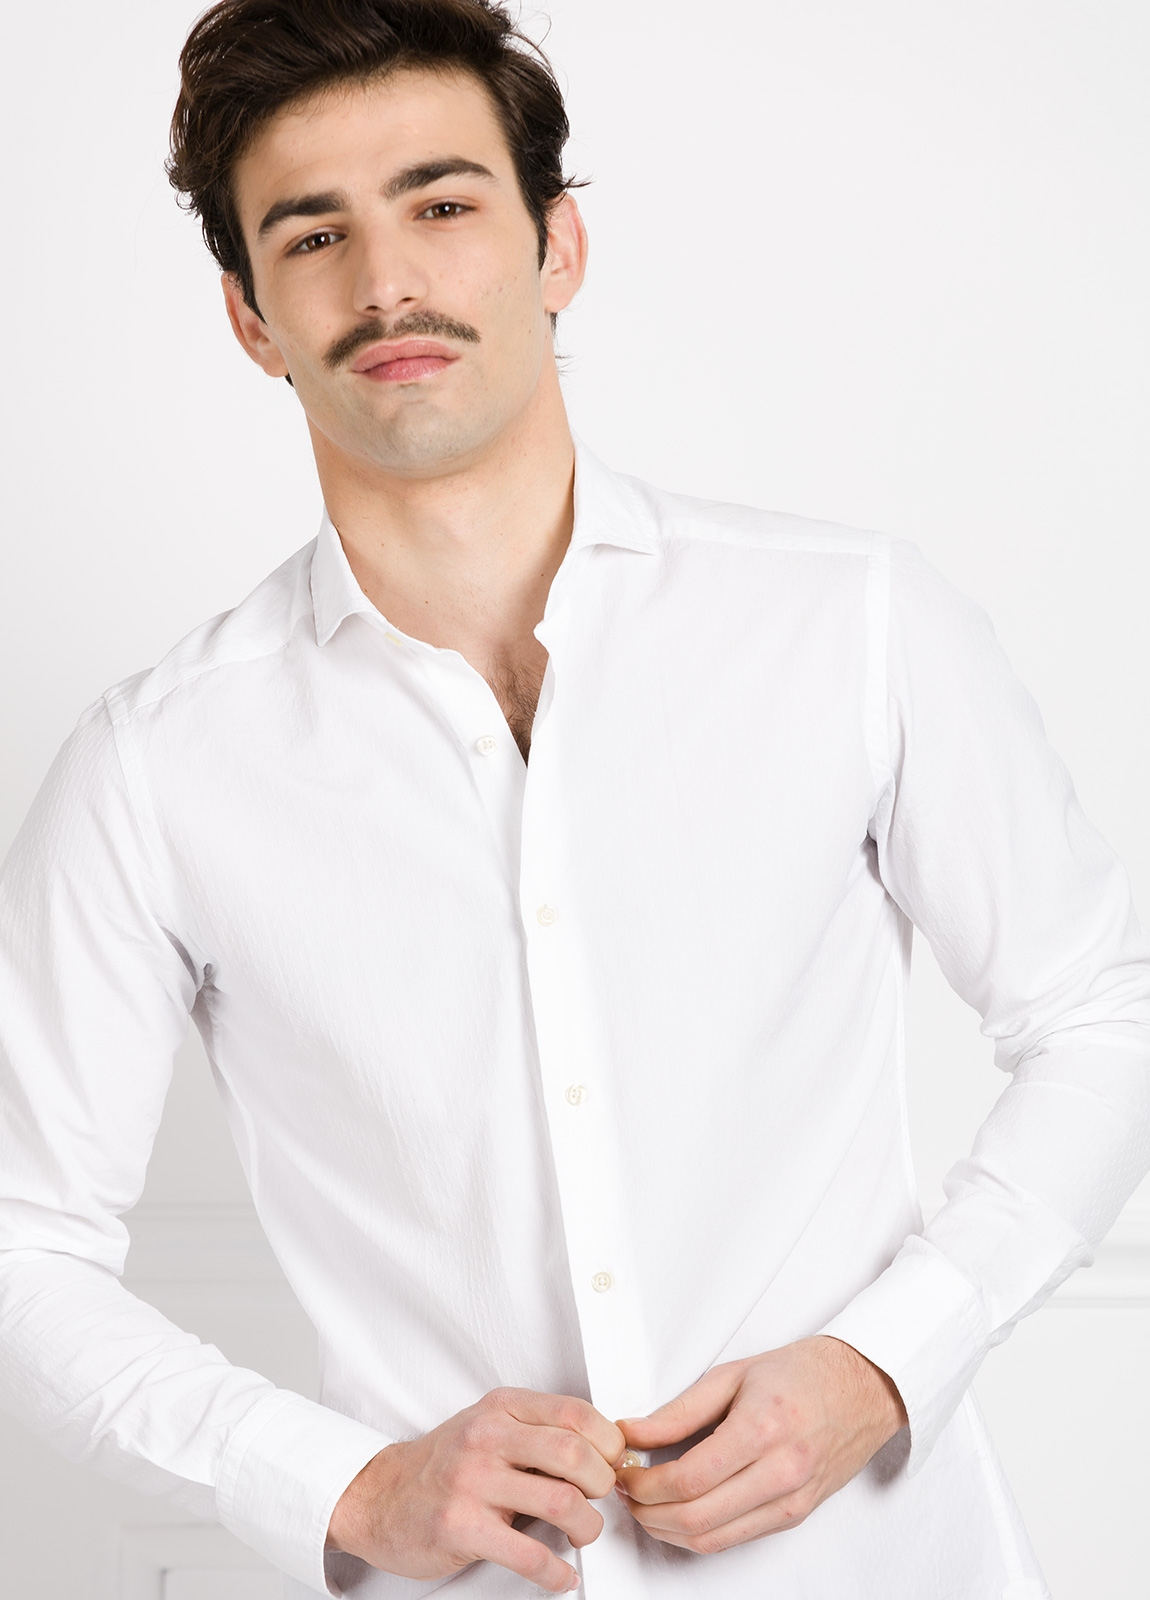 Camisa Leisure Wear SLIM FIT Modelo CAPRI color blanco micrograbado. 100% Algodón. - Ítem2